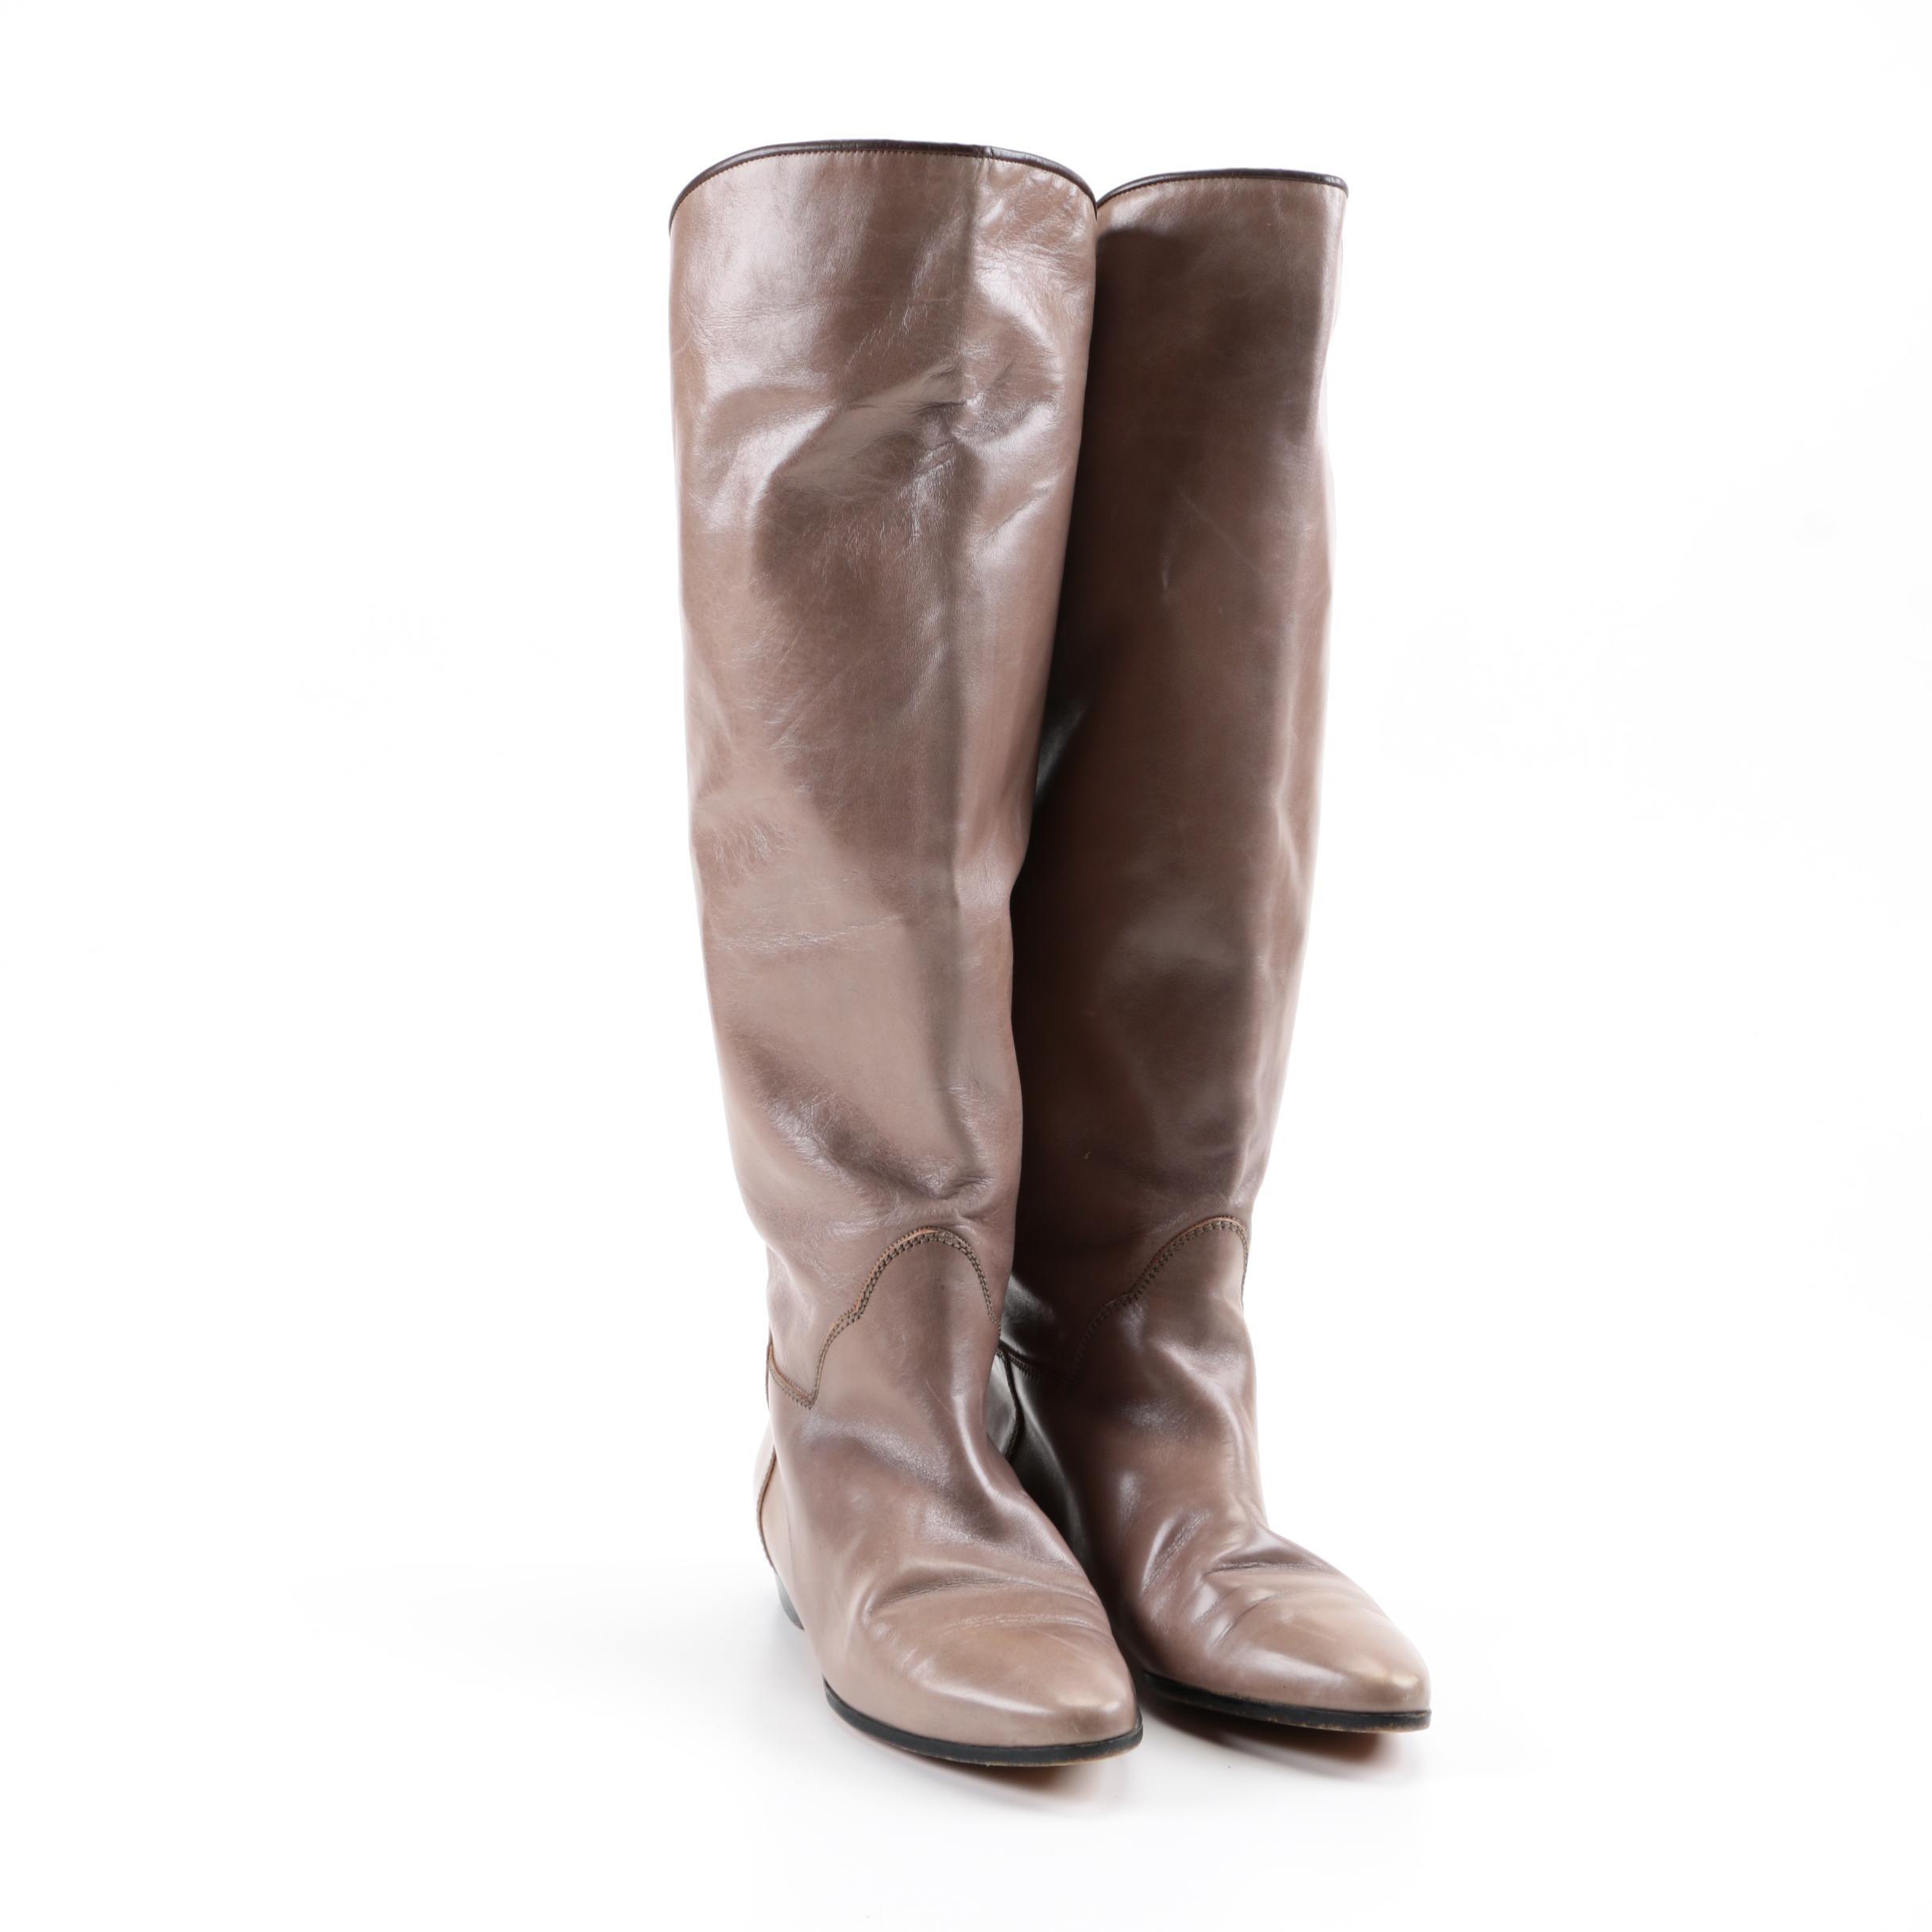 Women's Yves Saint Laurent Leather Boots